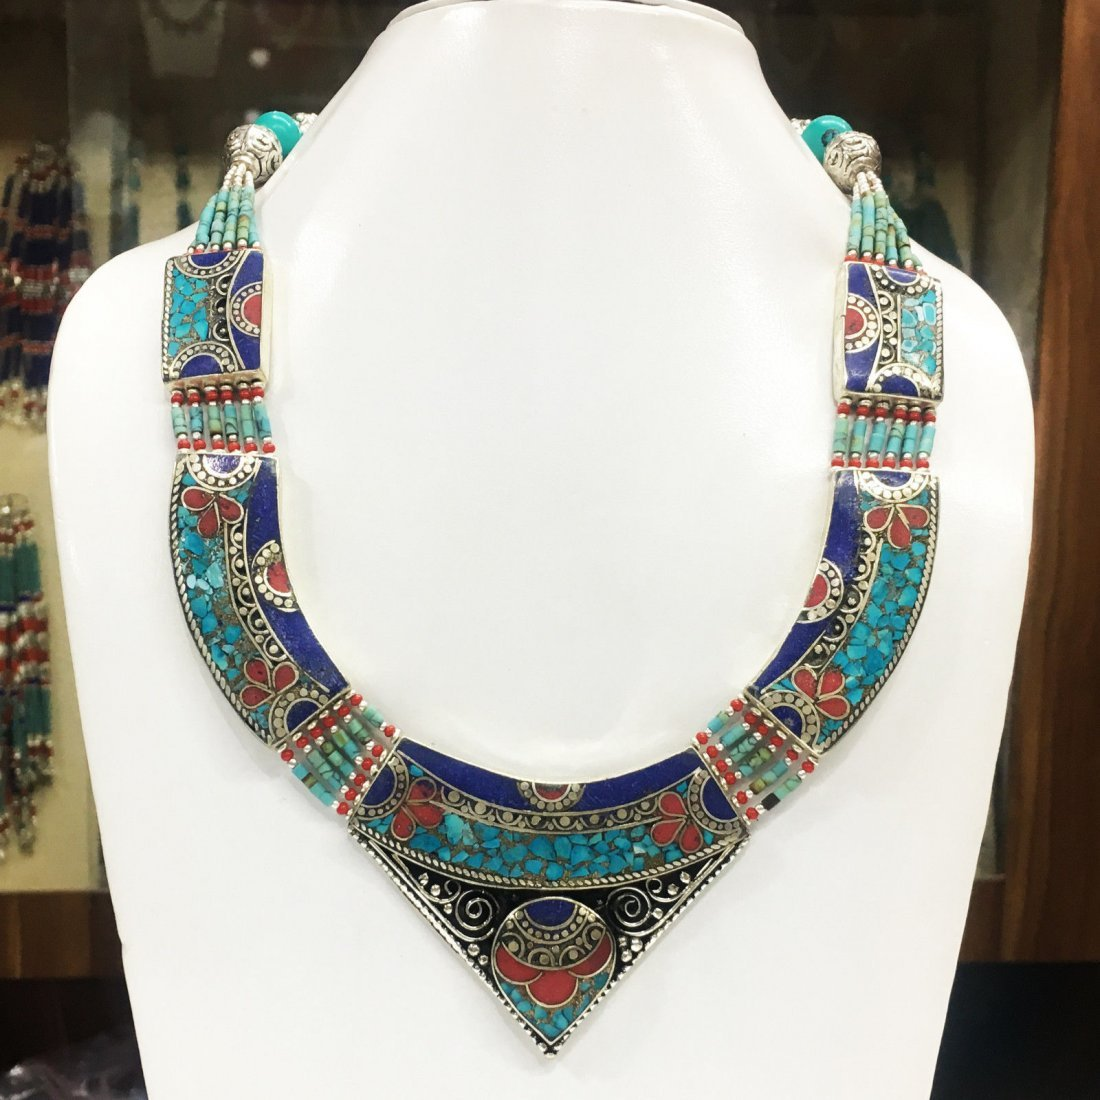 Boho Handmade Turquoise & Coral Necklace